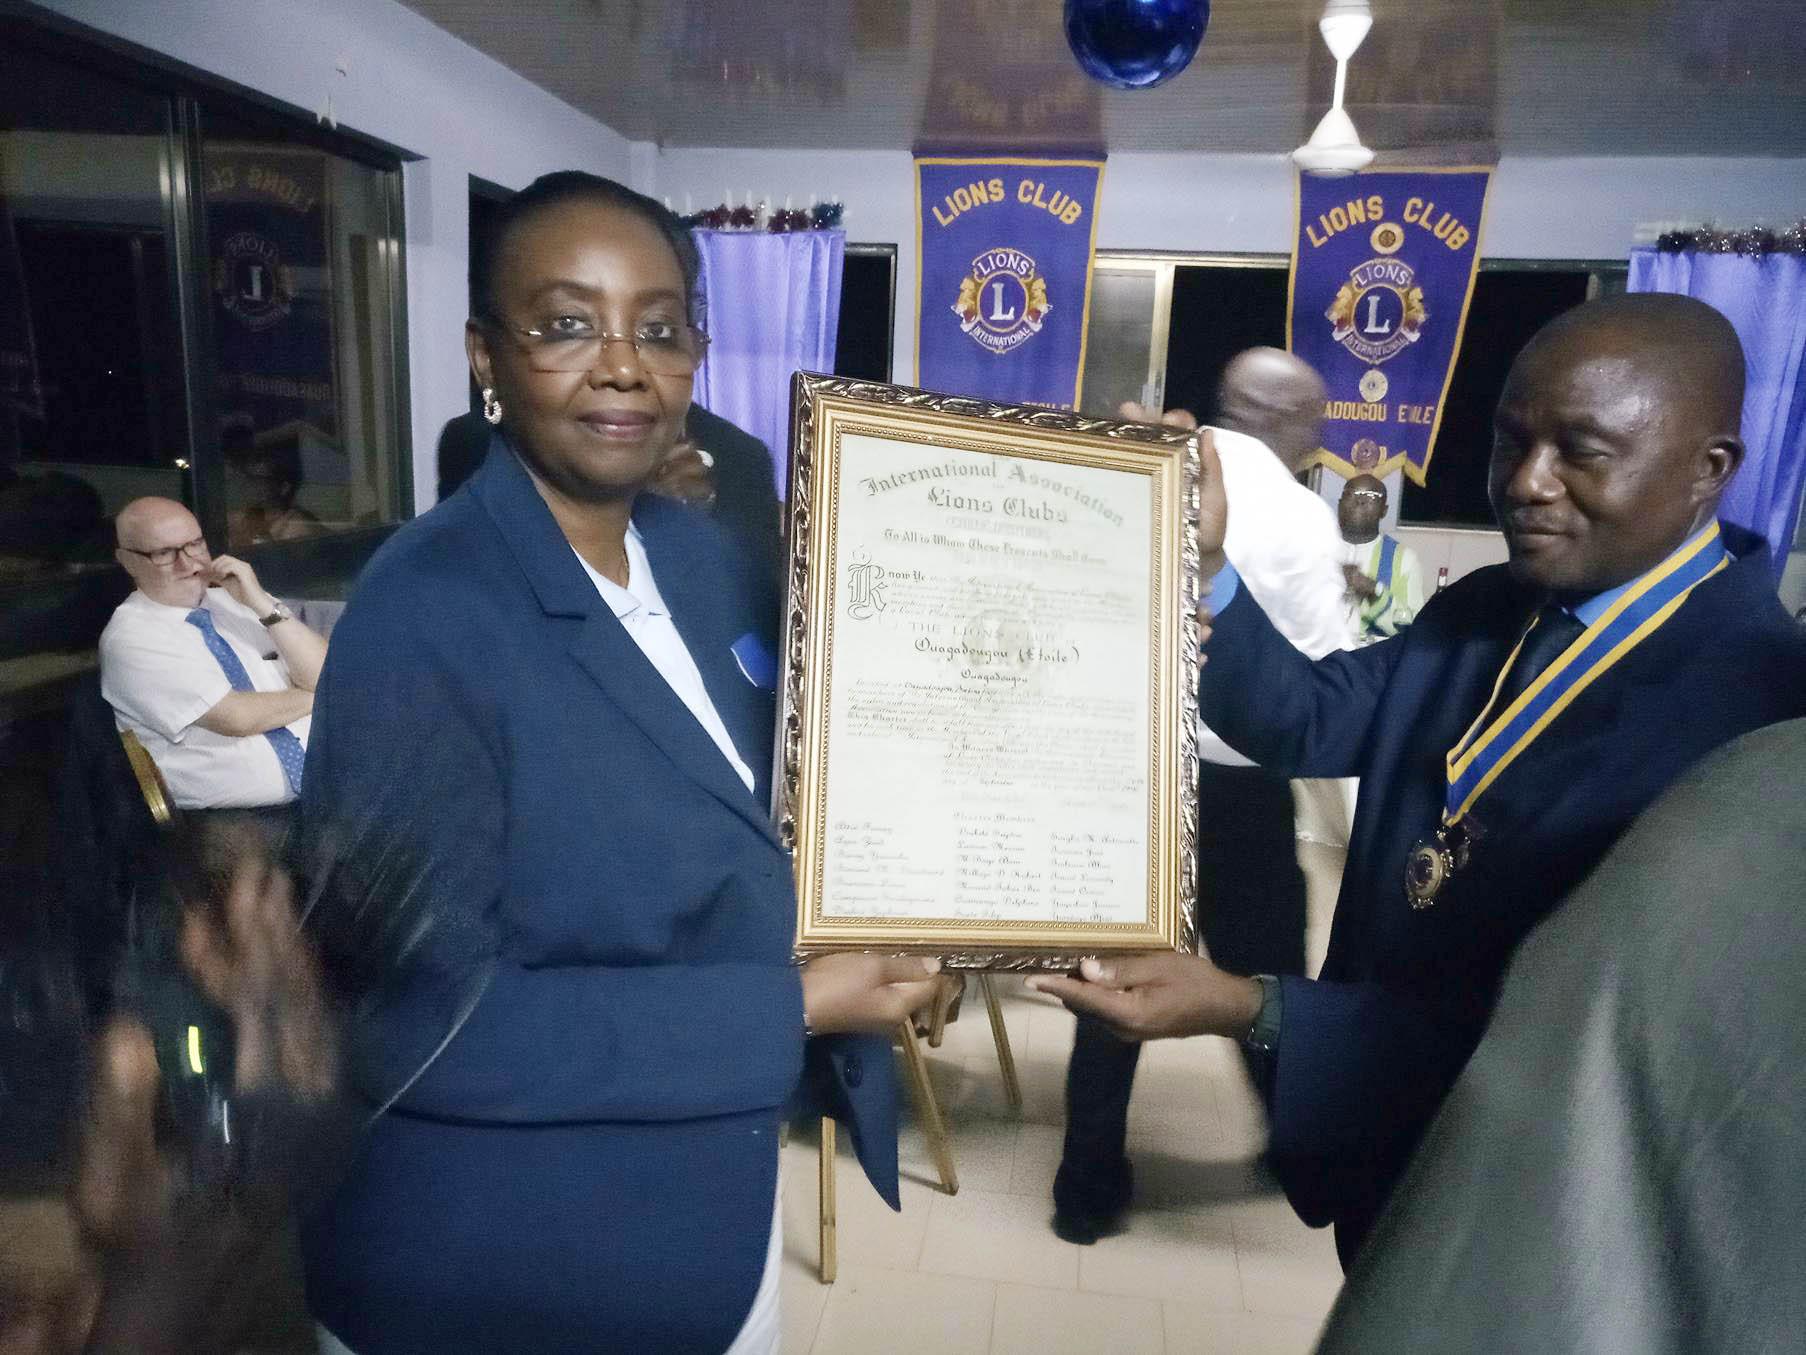 Lions club Ouagadougou Etoile: Mariama Sow, nouvelle présidente